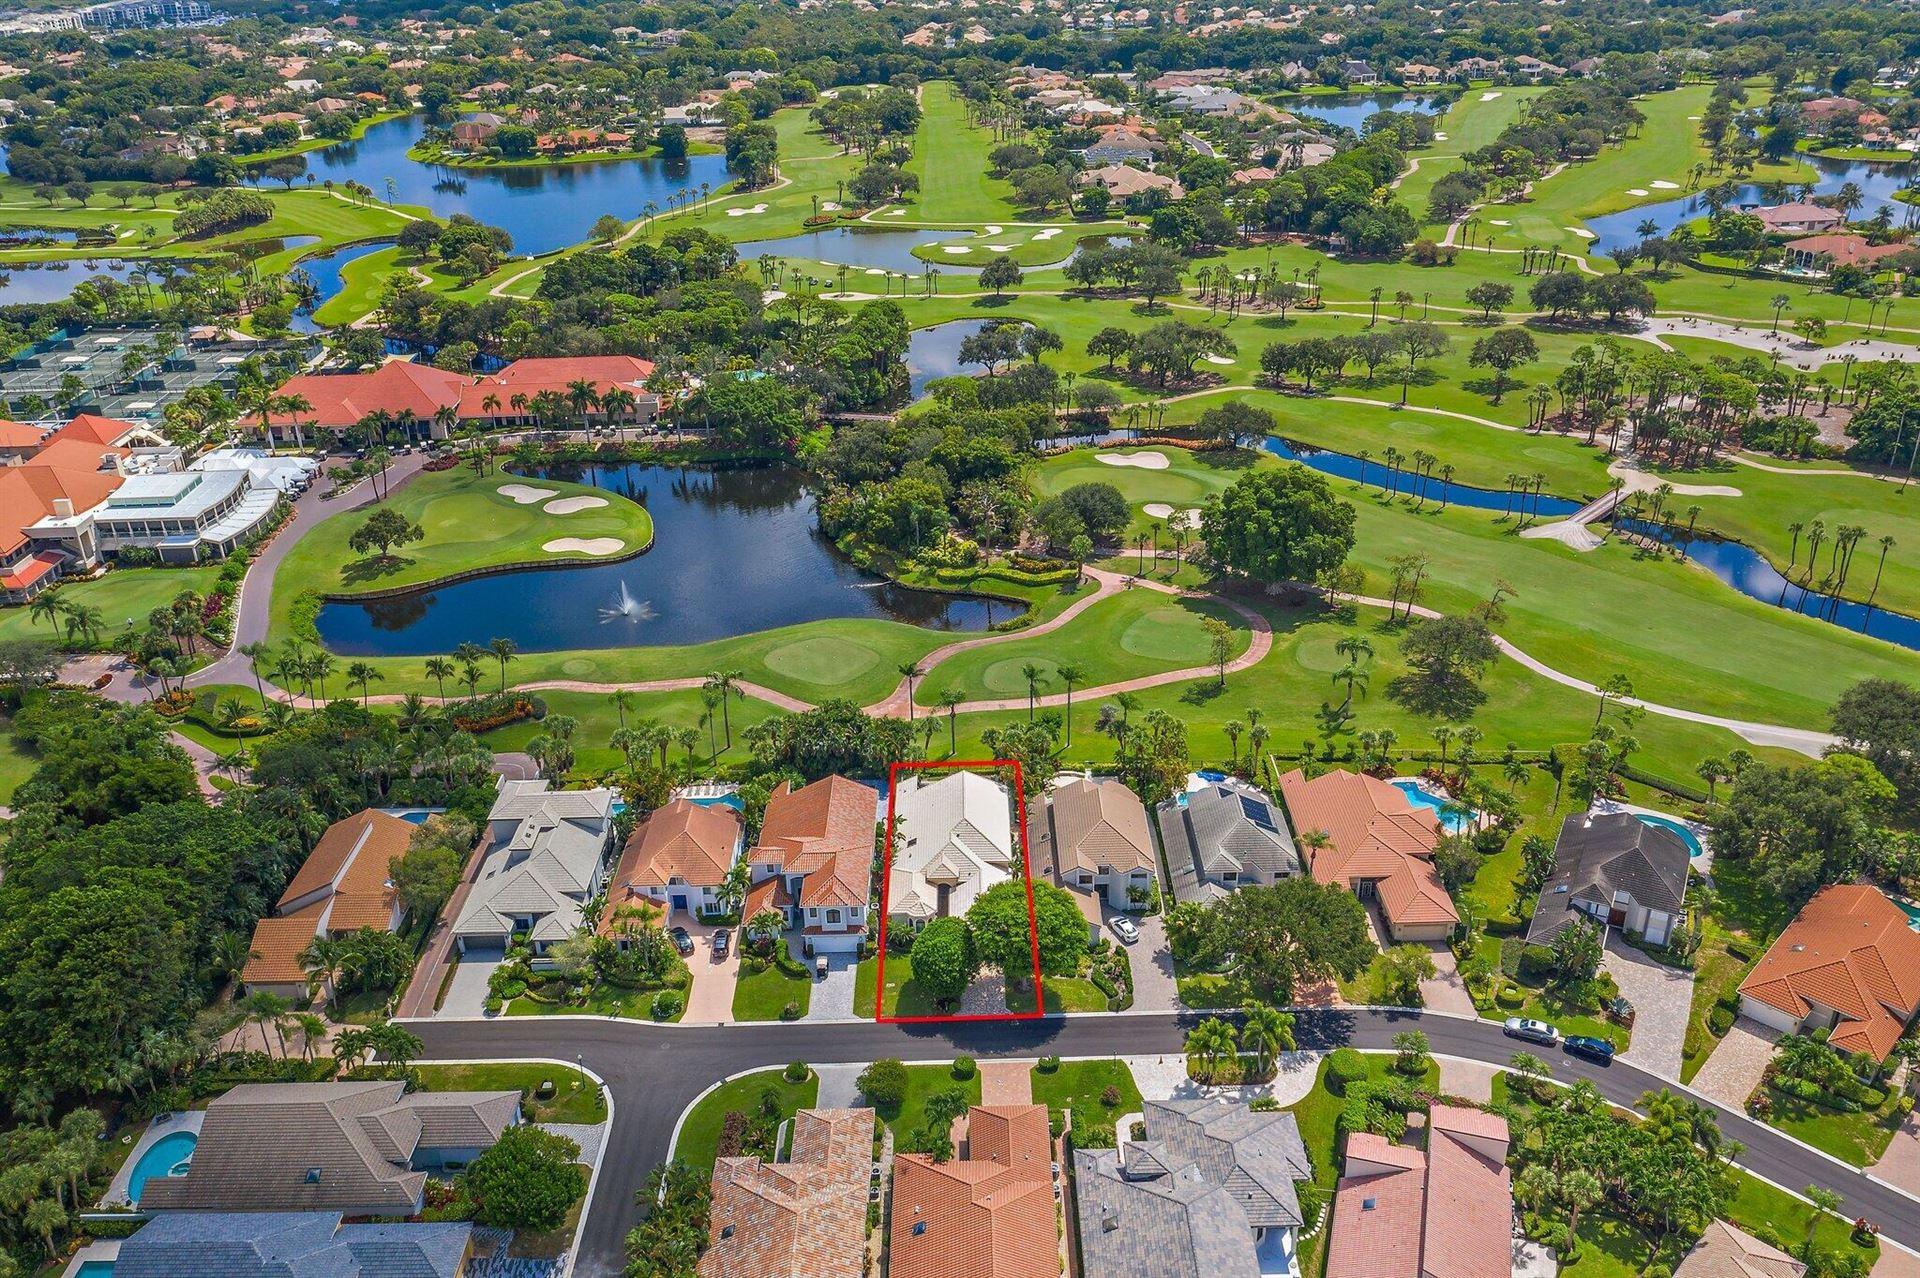 Photo of 13364 Verdun Drive, Palm Beach Gardens, FL 33410 (MLS # RX-10744270)